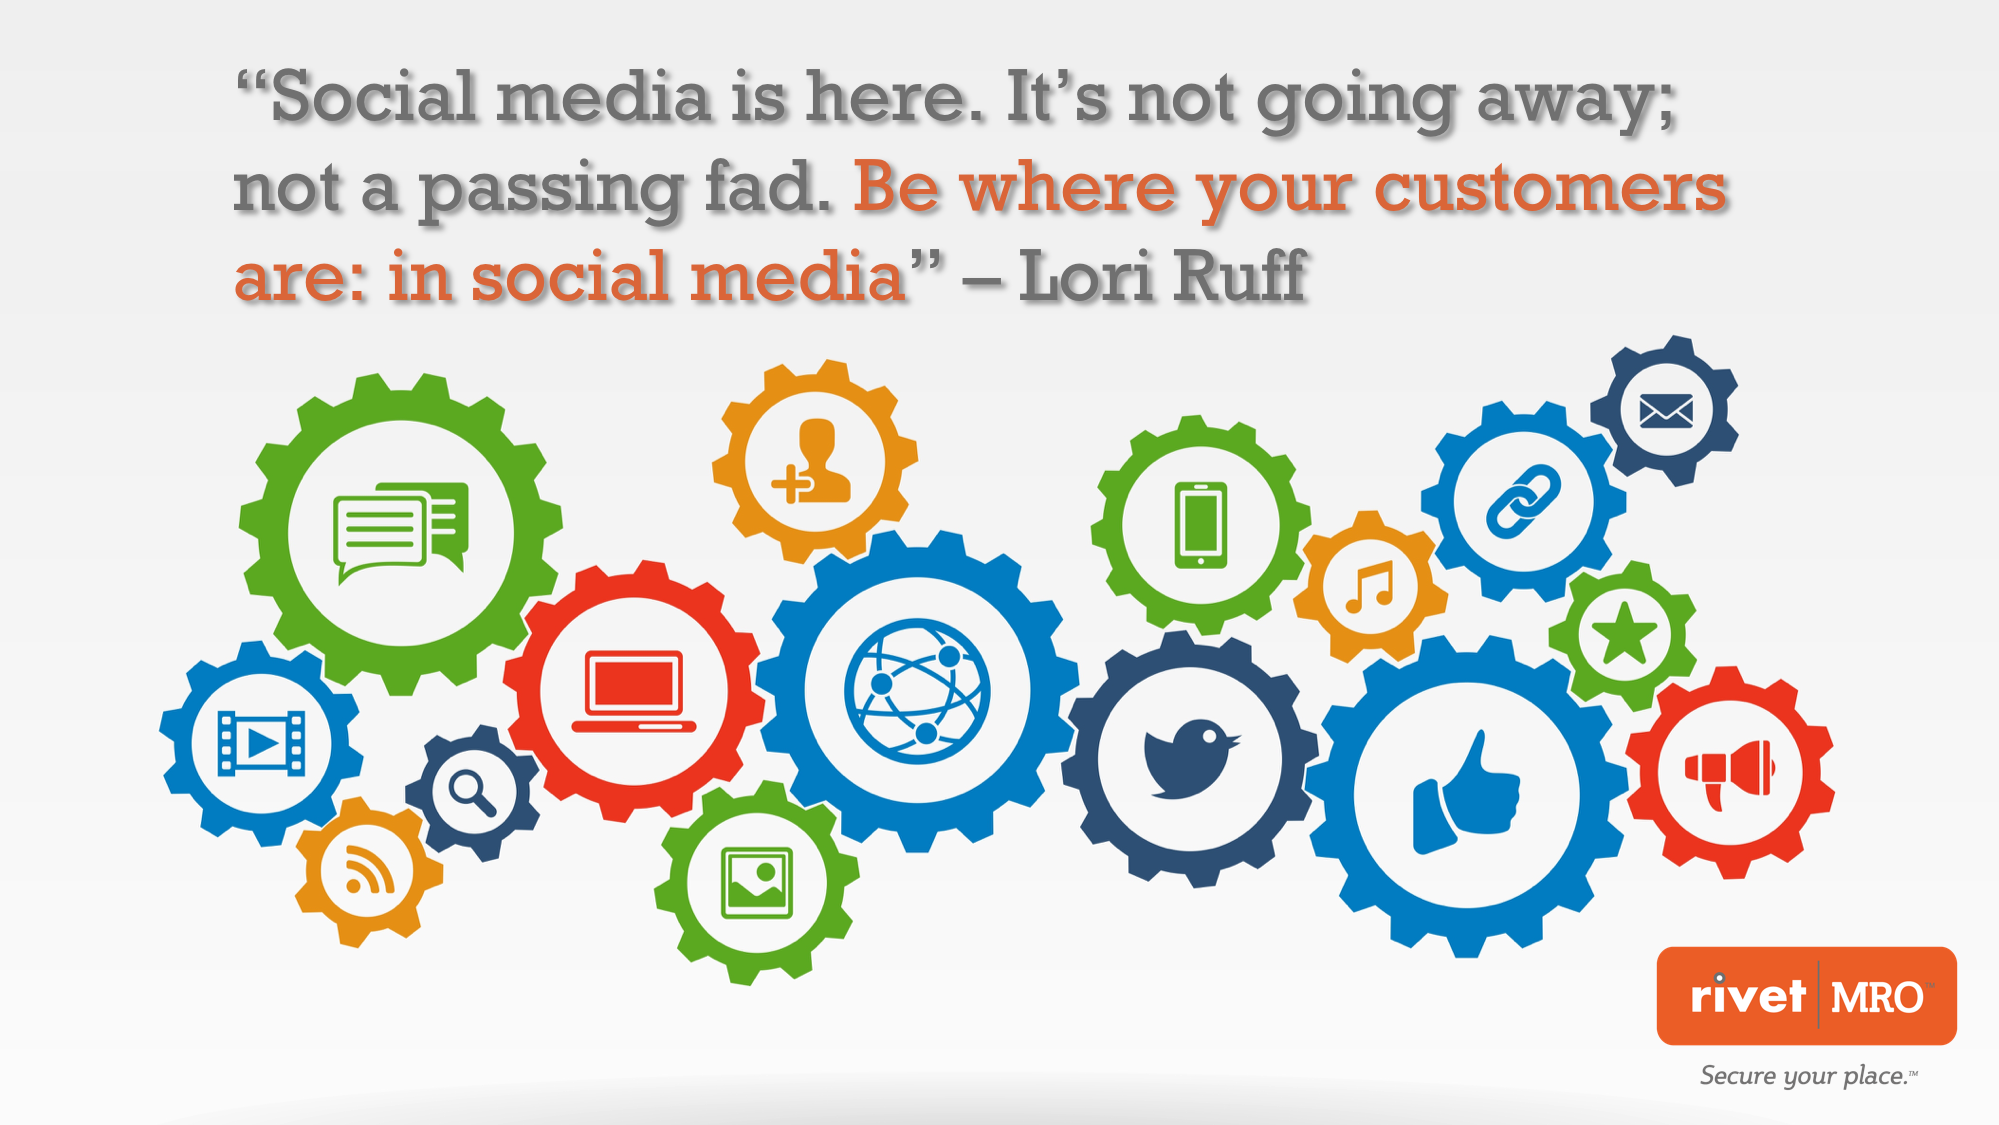 Distributor Social: How Social Media can Help Industrial Distributors Increase Sales